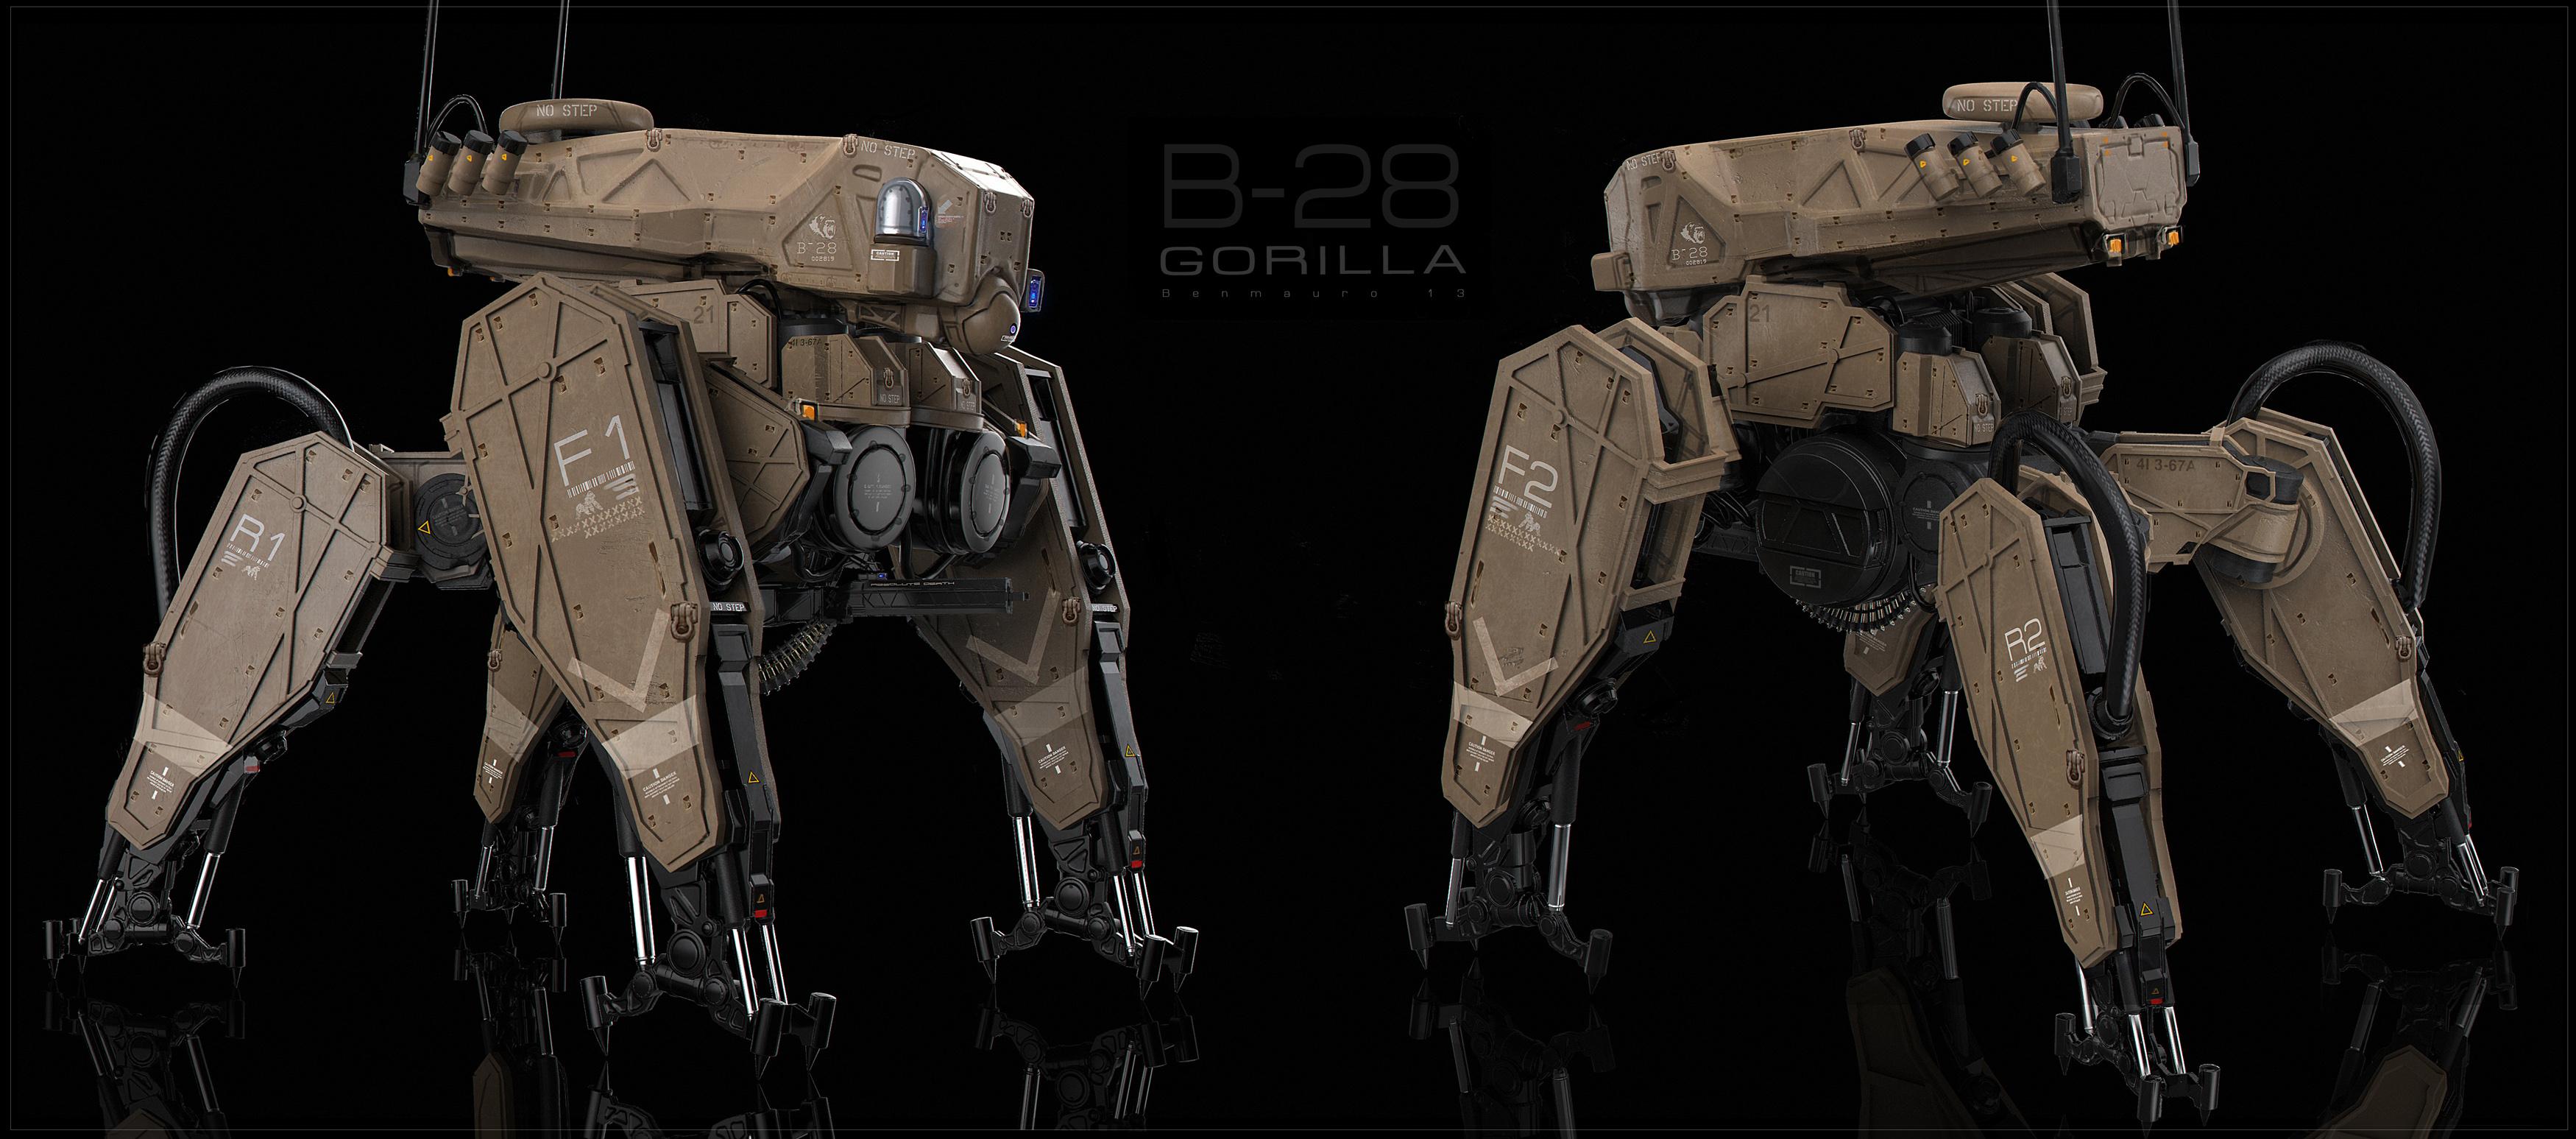 Gorilla Tank ortho by BenMauro